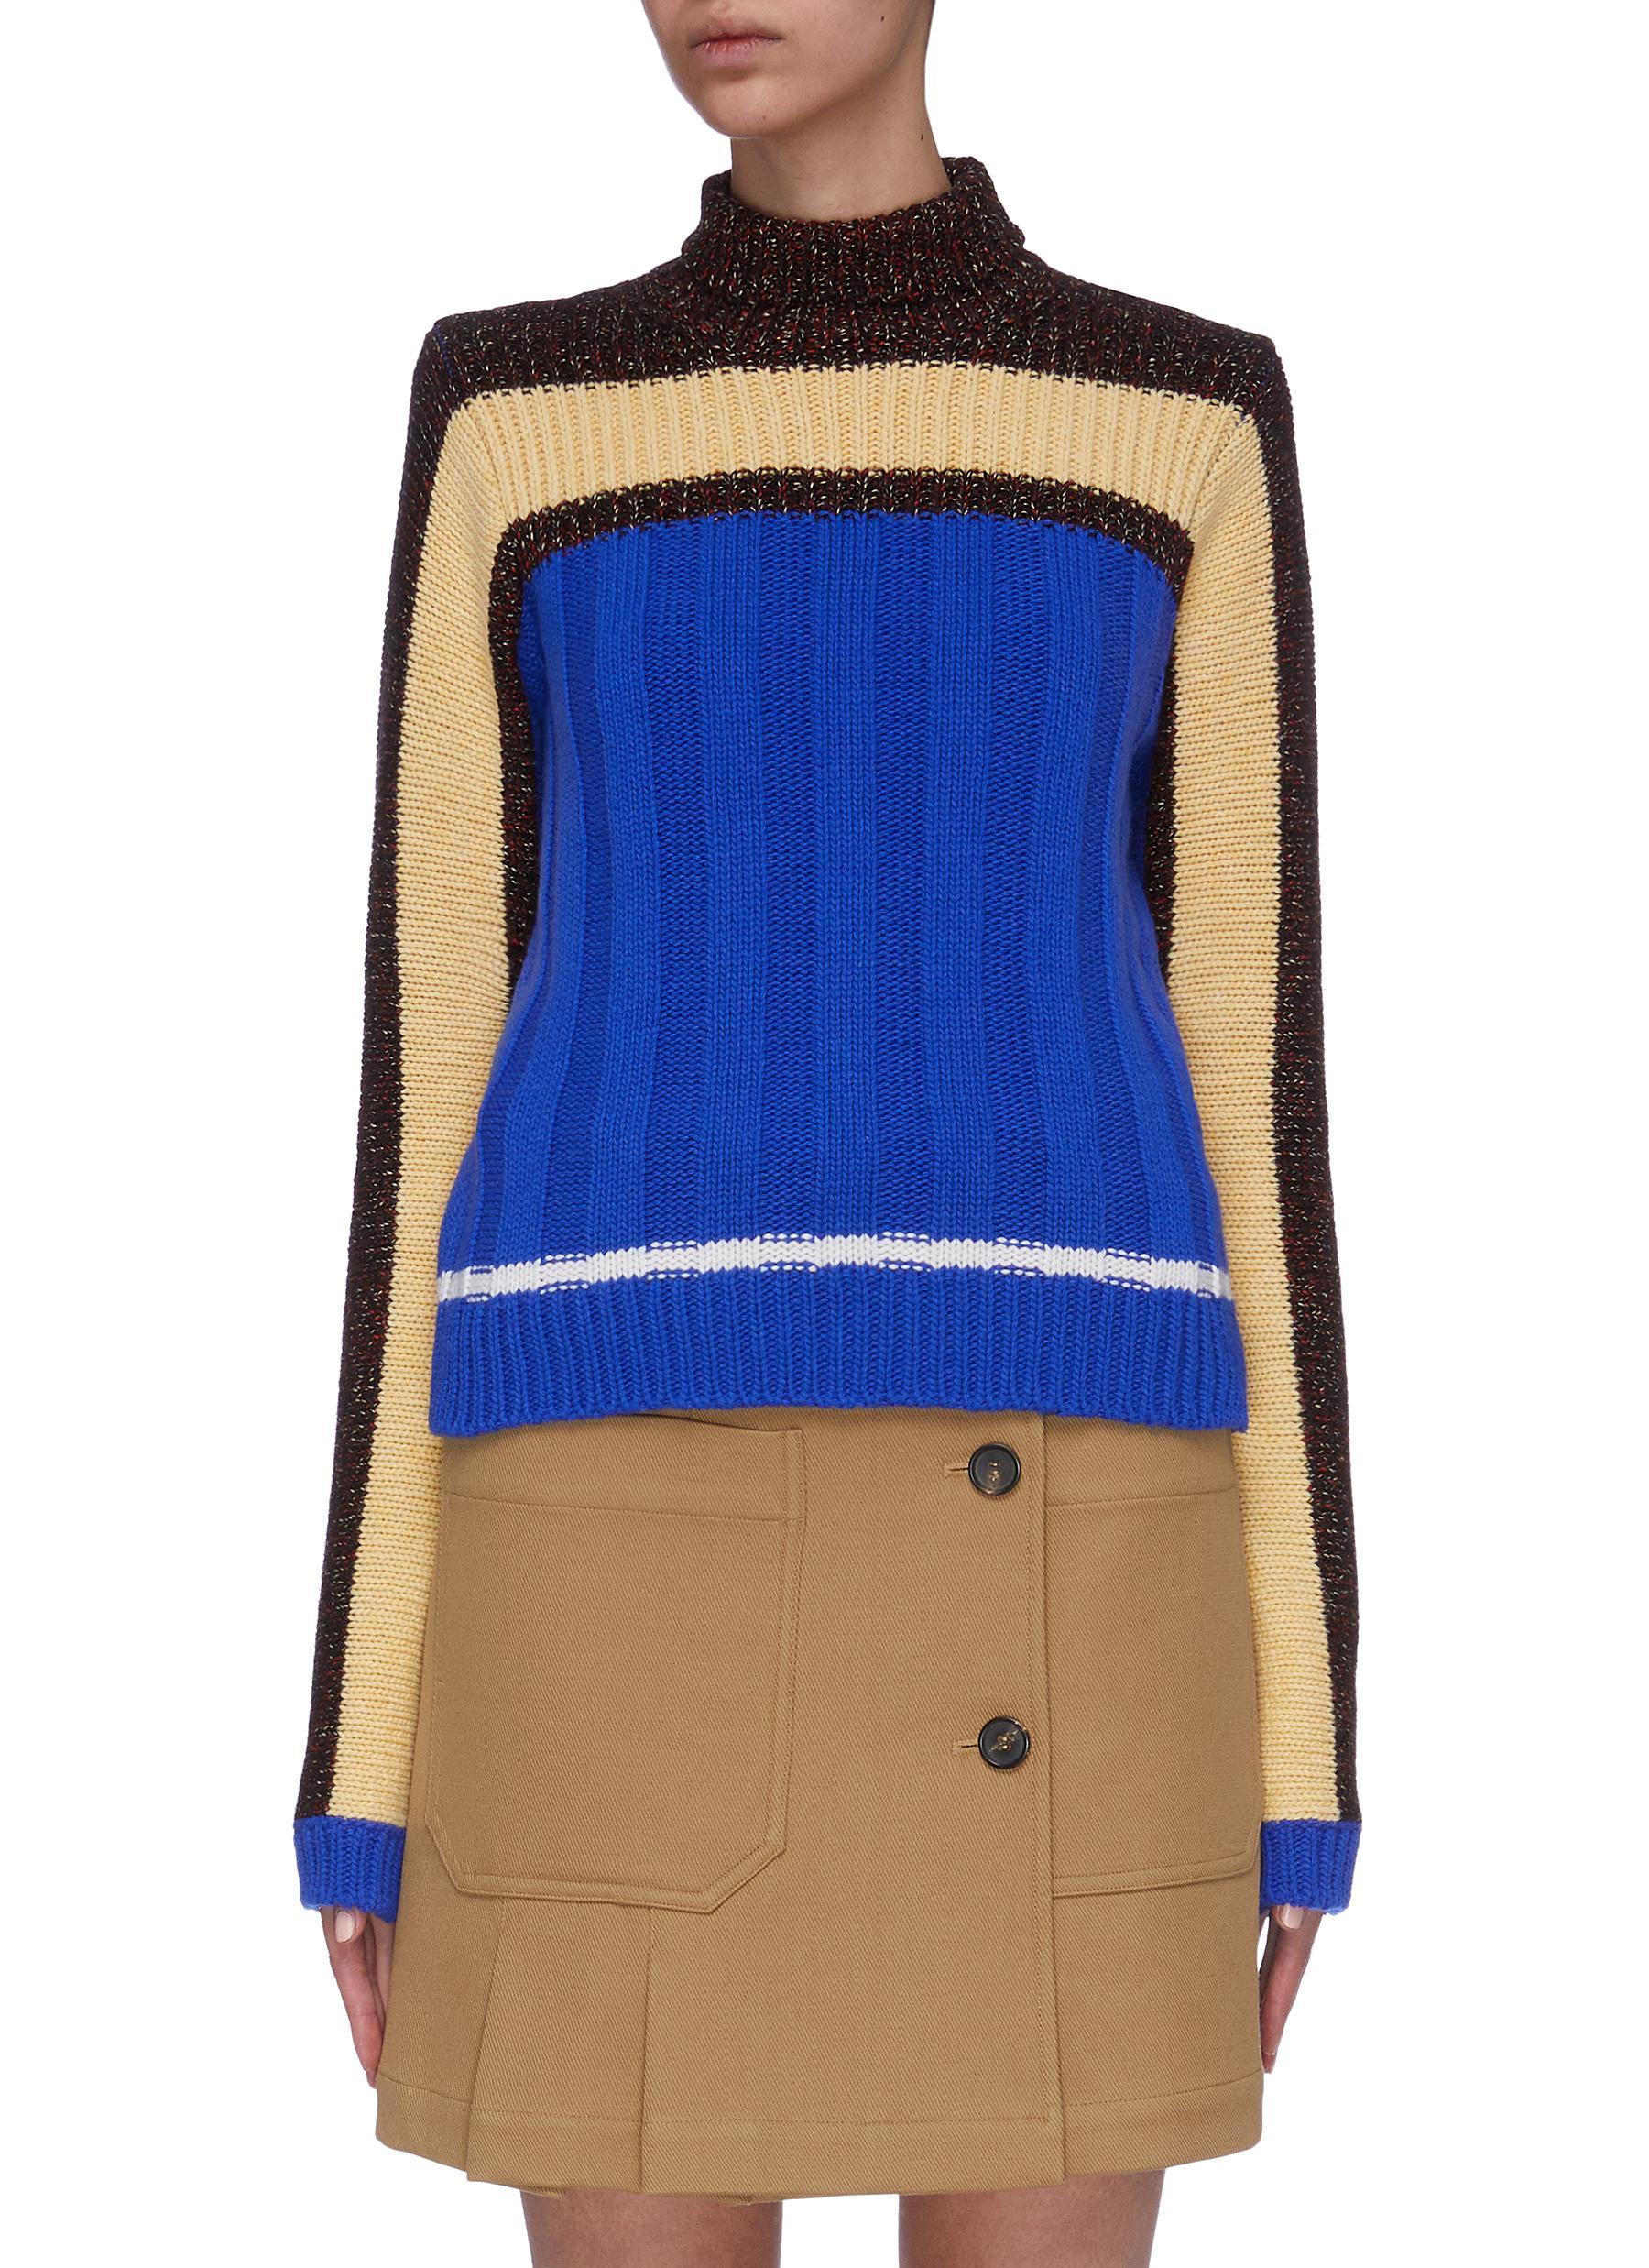 Stripe colourblock turtleneck sweater by Plan C